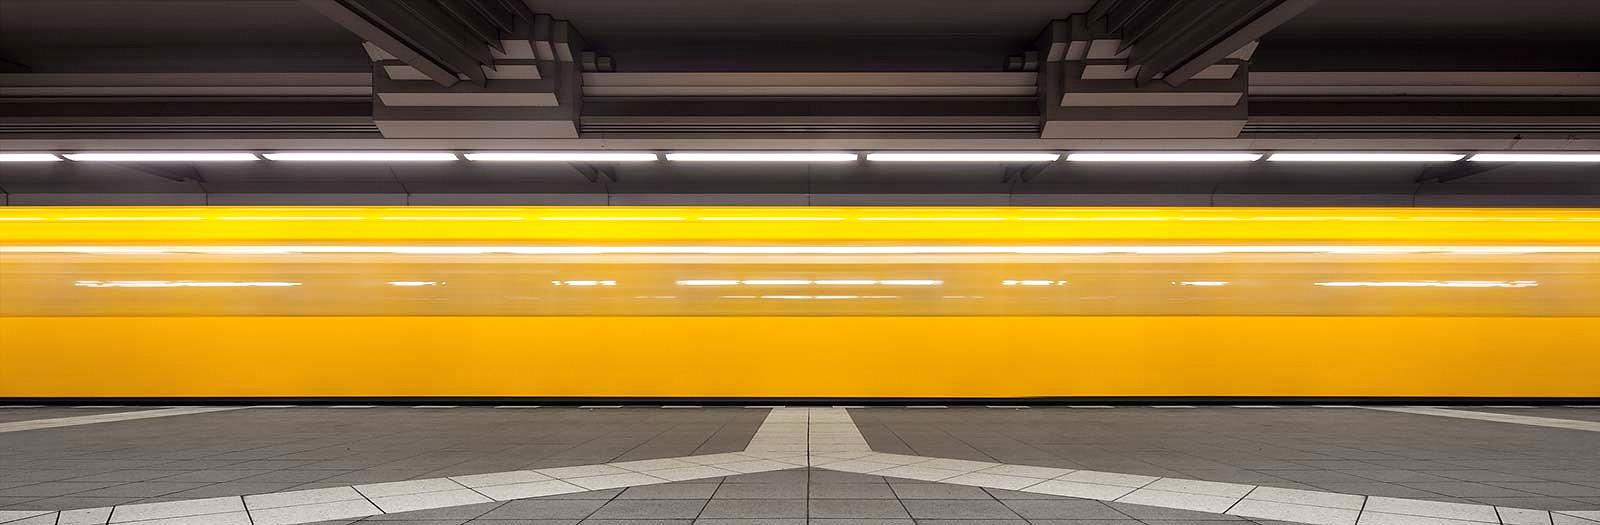 Non-stop I by Markus Studtmann